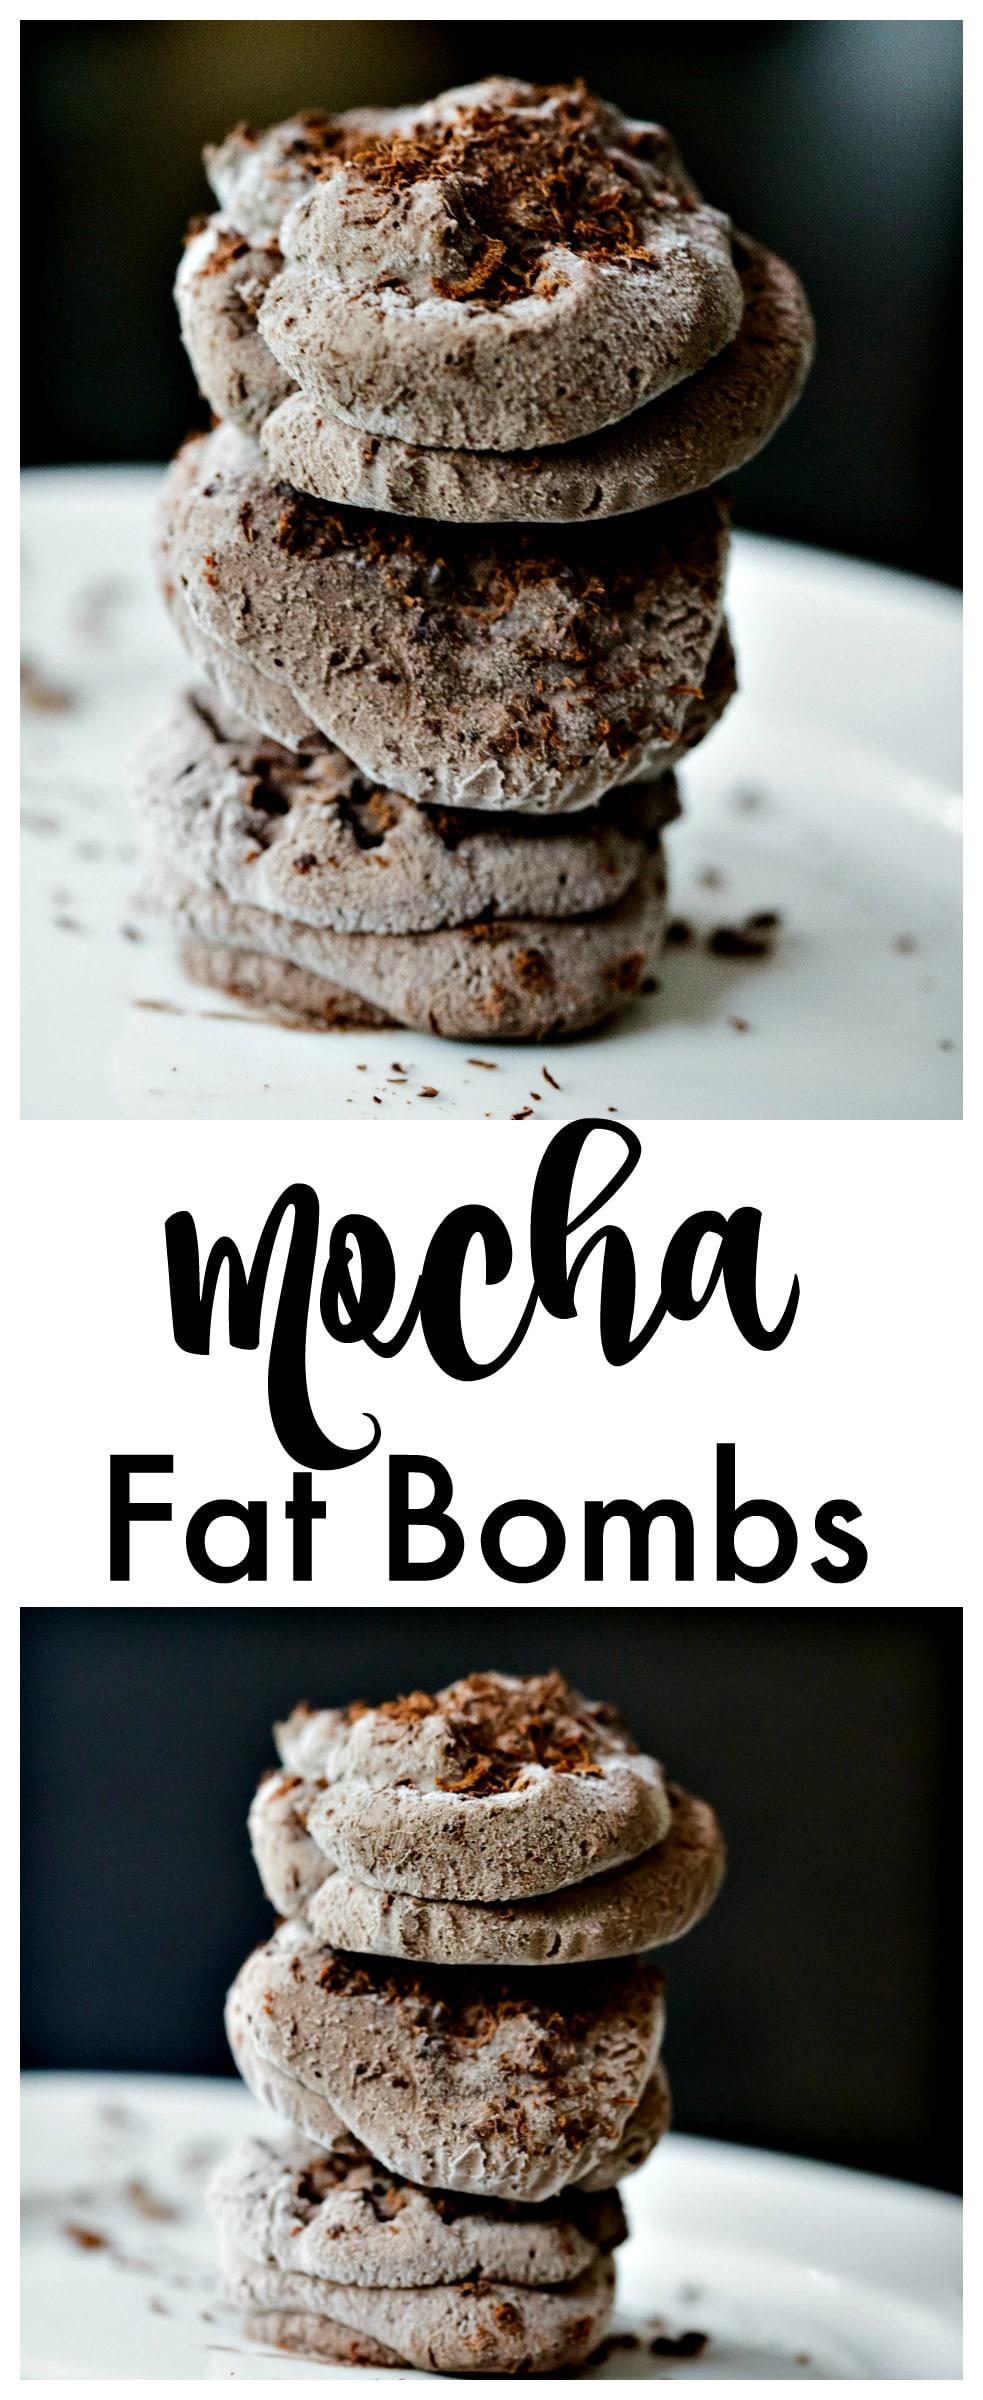 Mocha Fat Bombs